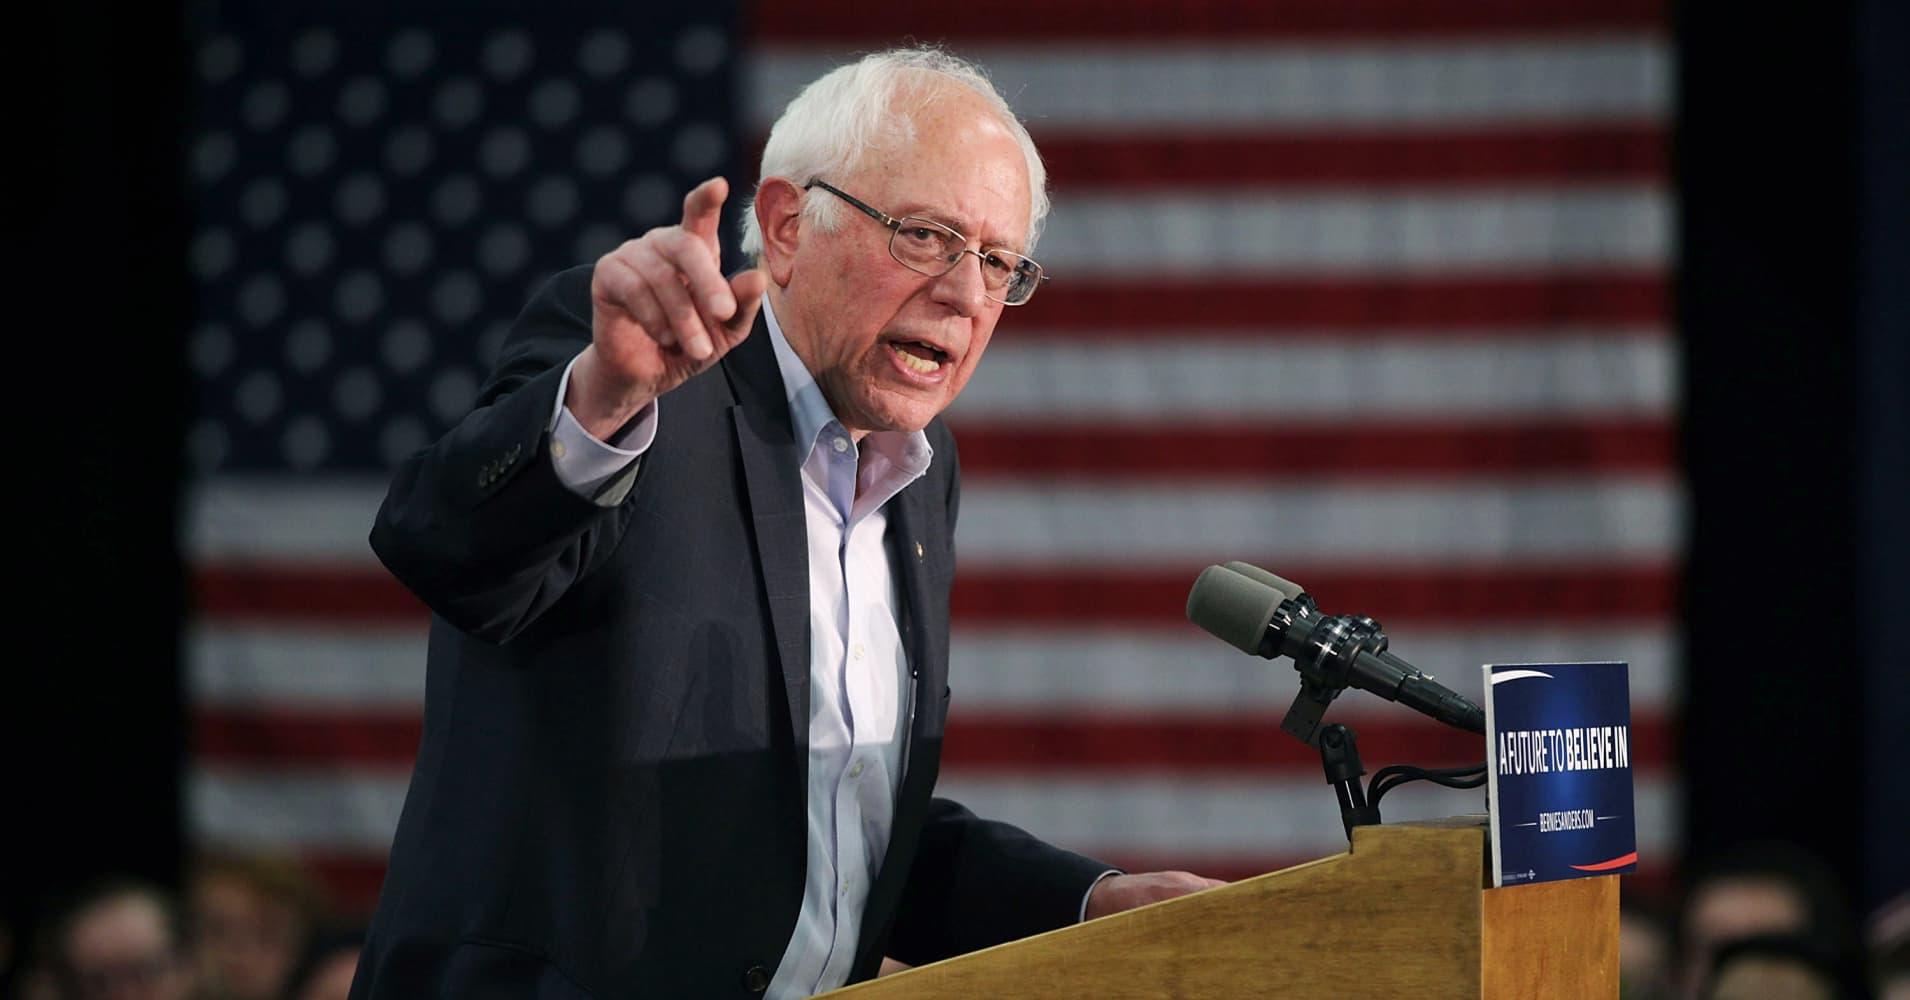 Looks like Bernie Sanders is running for president again, despite big warning signs